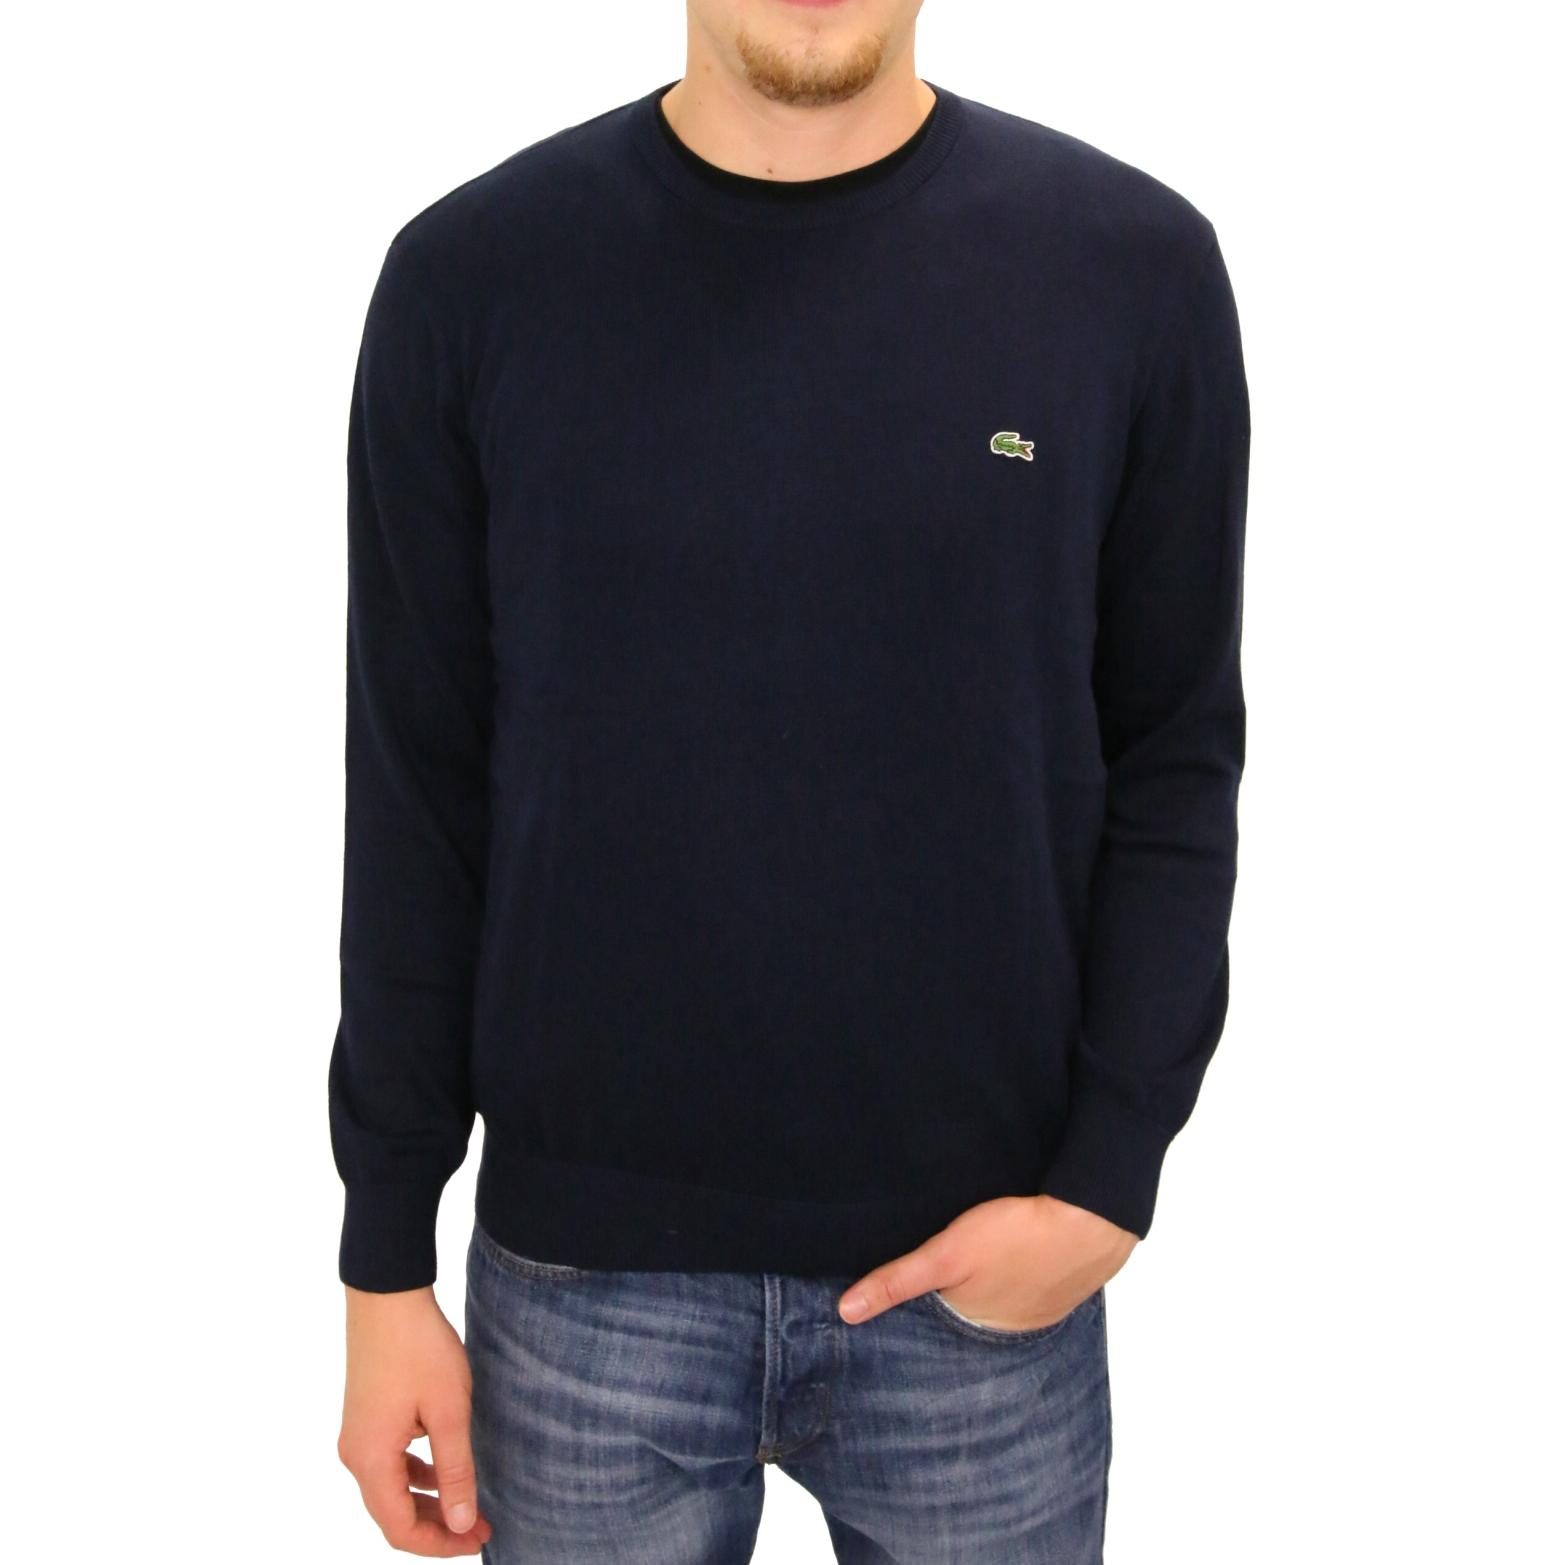 lacoste pullover strickpullover rundhals baumwolle herren diverse farben ebay. Black Bedroom Furniture Sets. Home Design Ideas